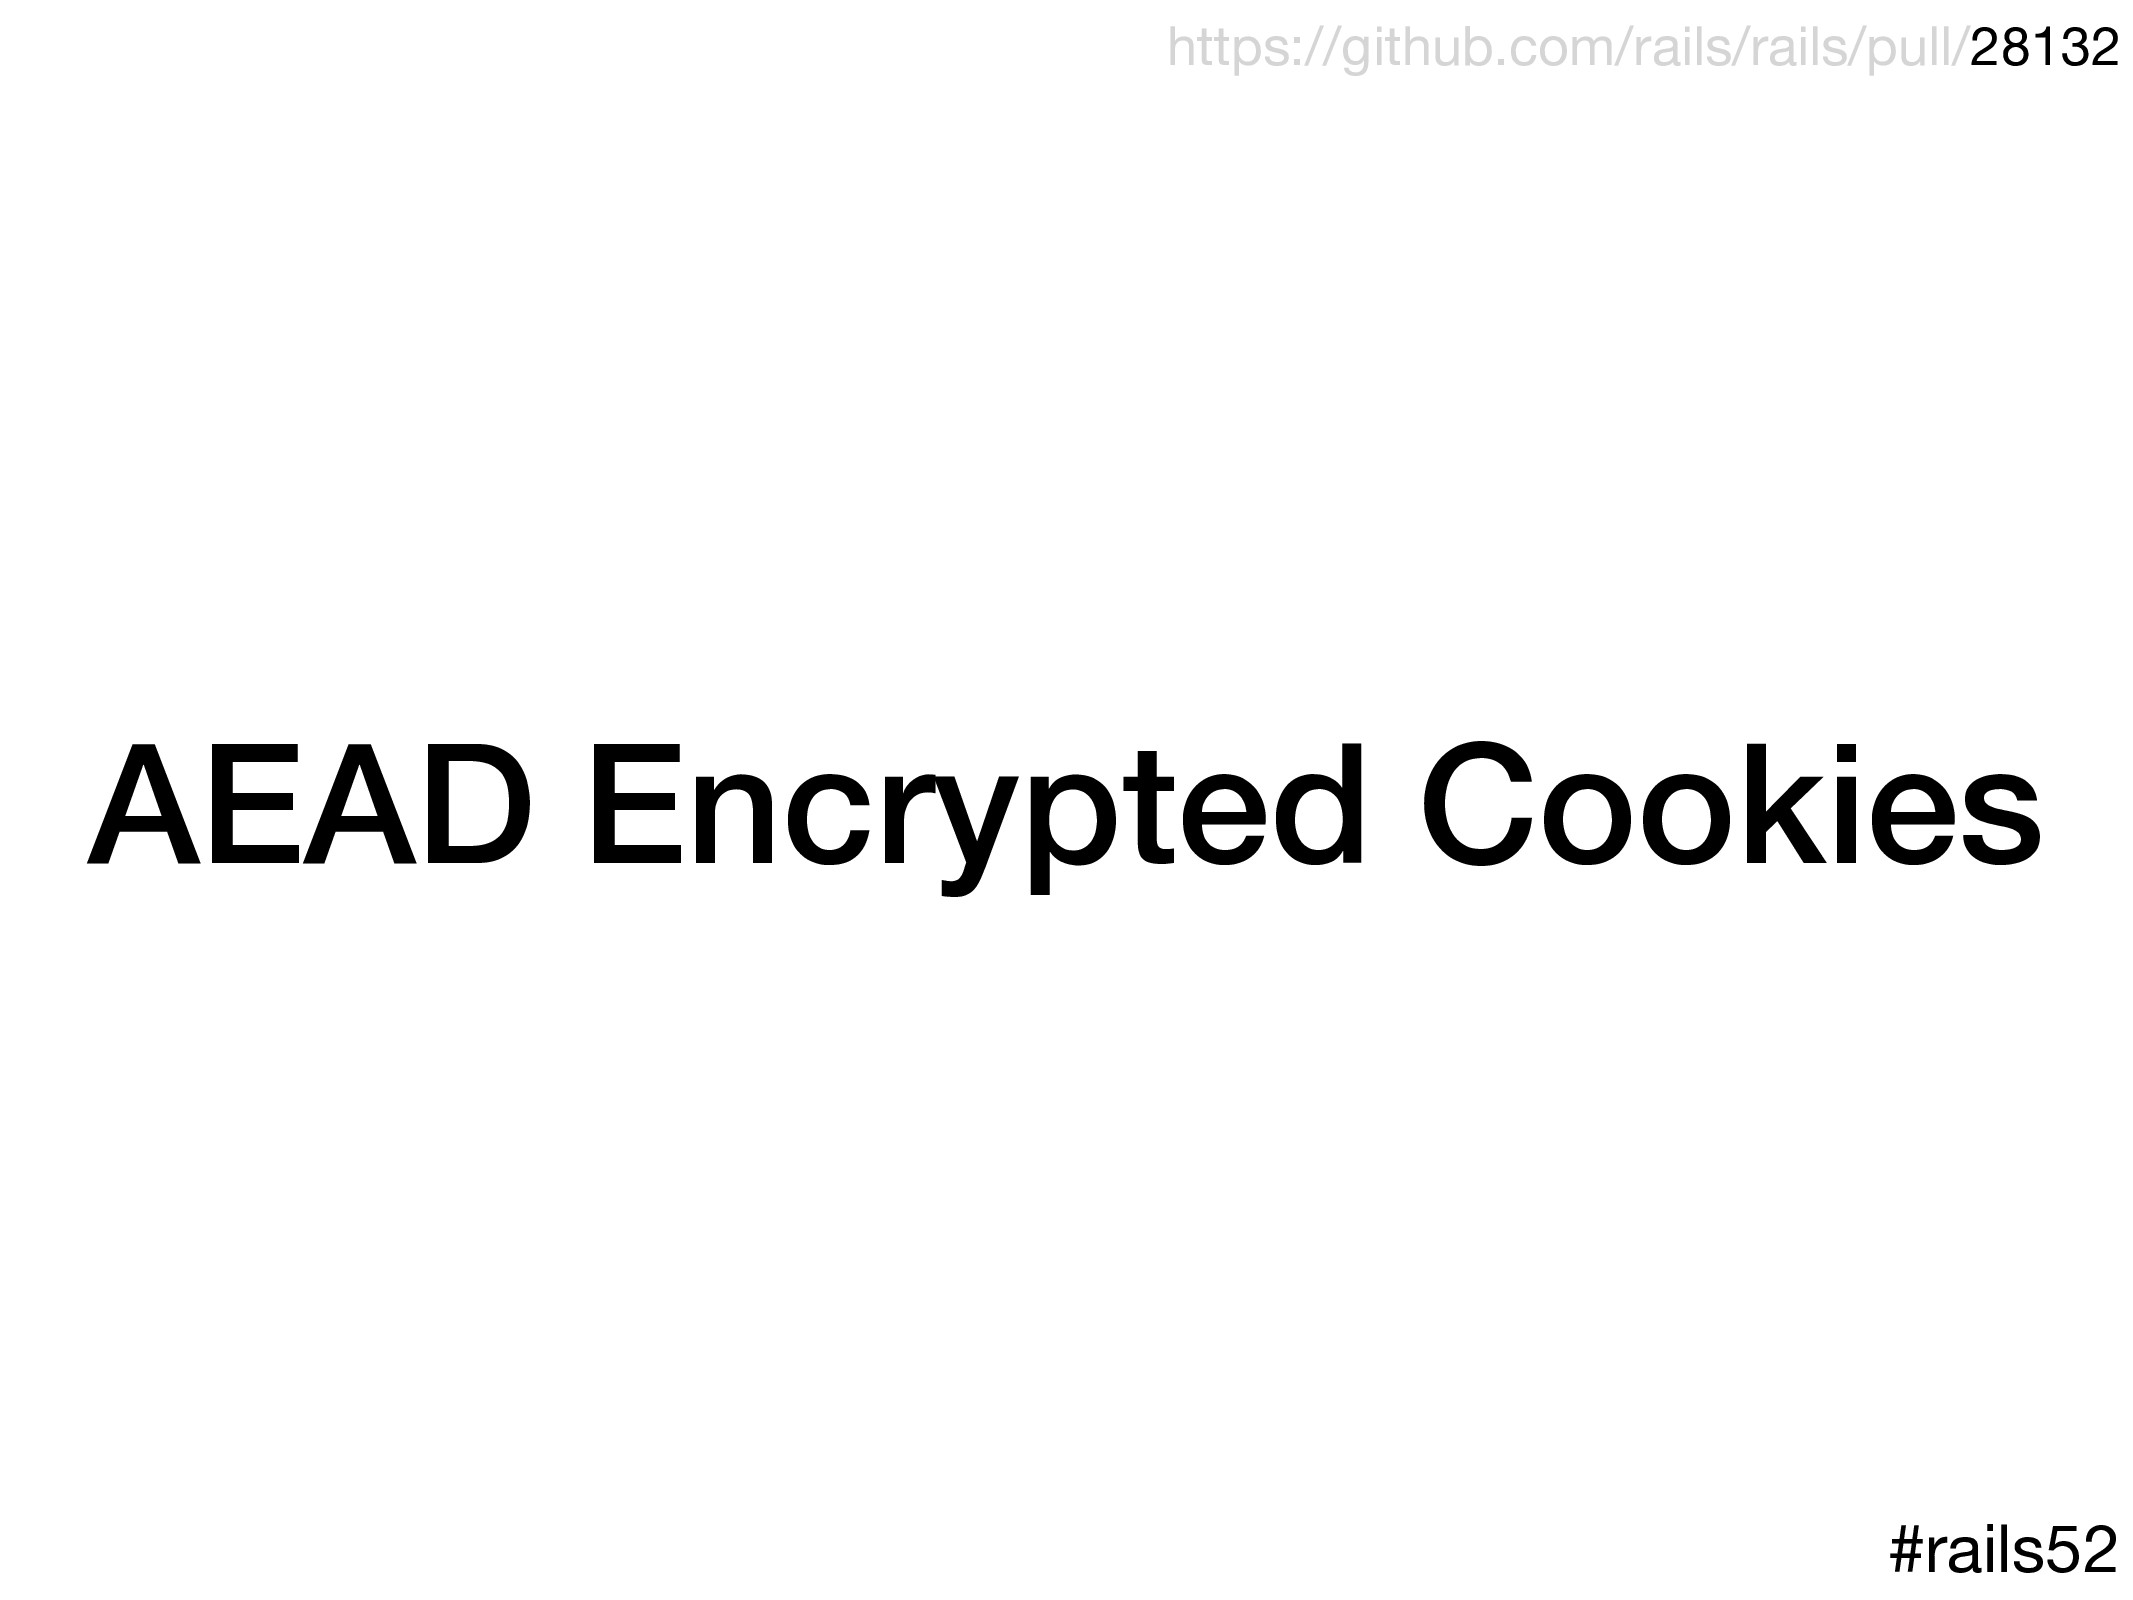 AEAD Encrypted Cookies #rails52 https://github....